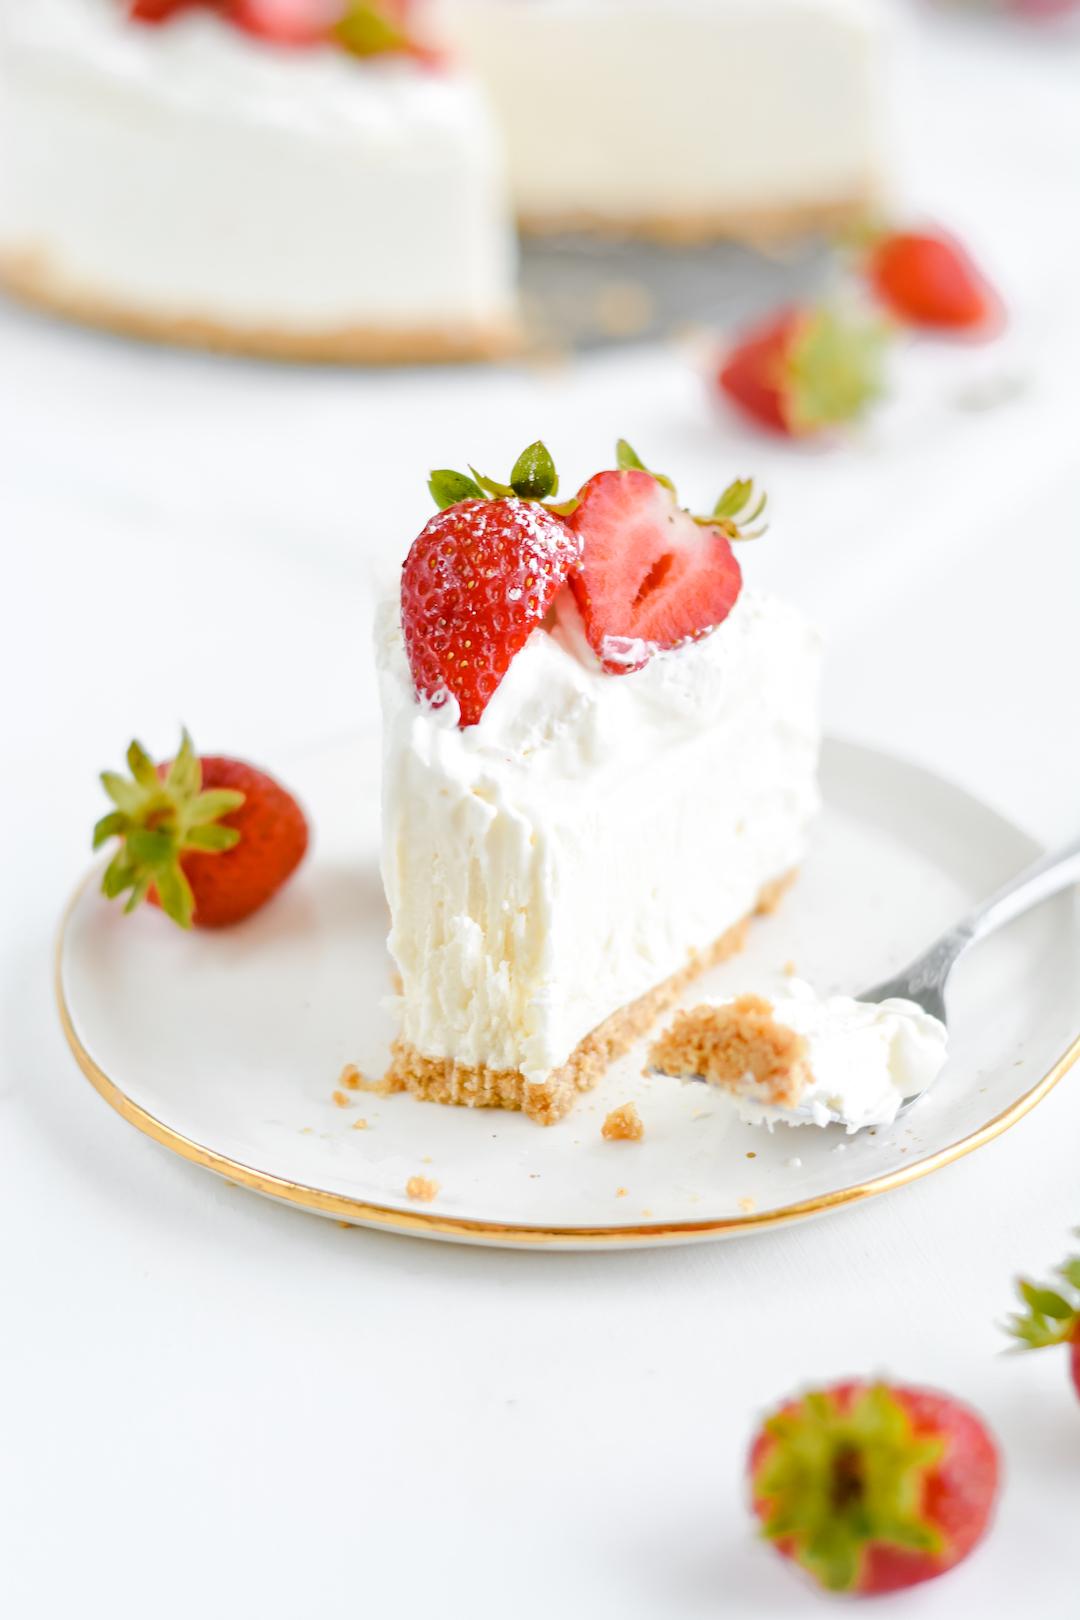 Classic No-Bake Cheesecake